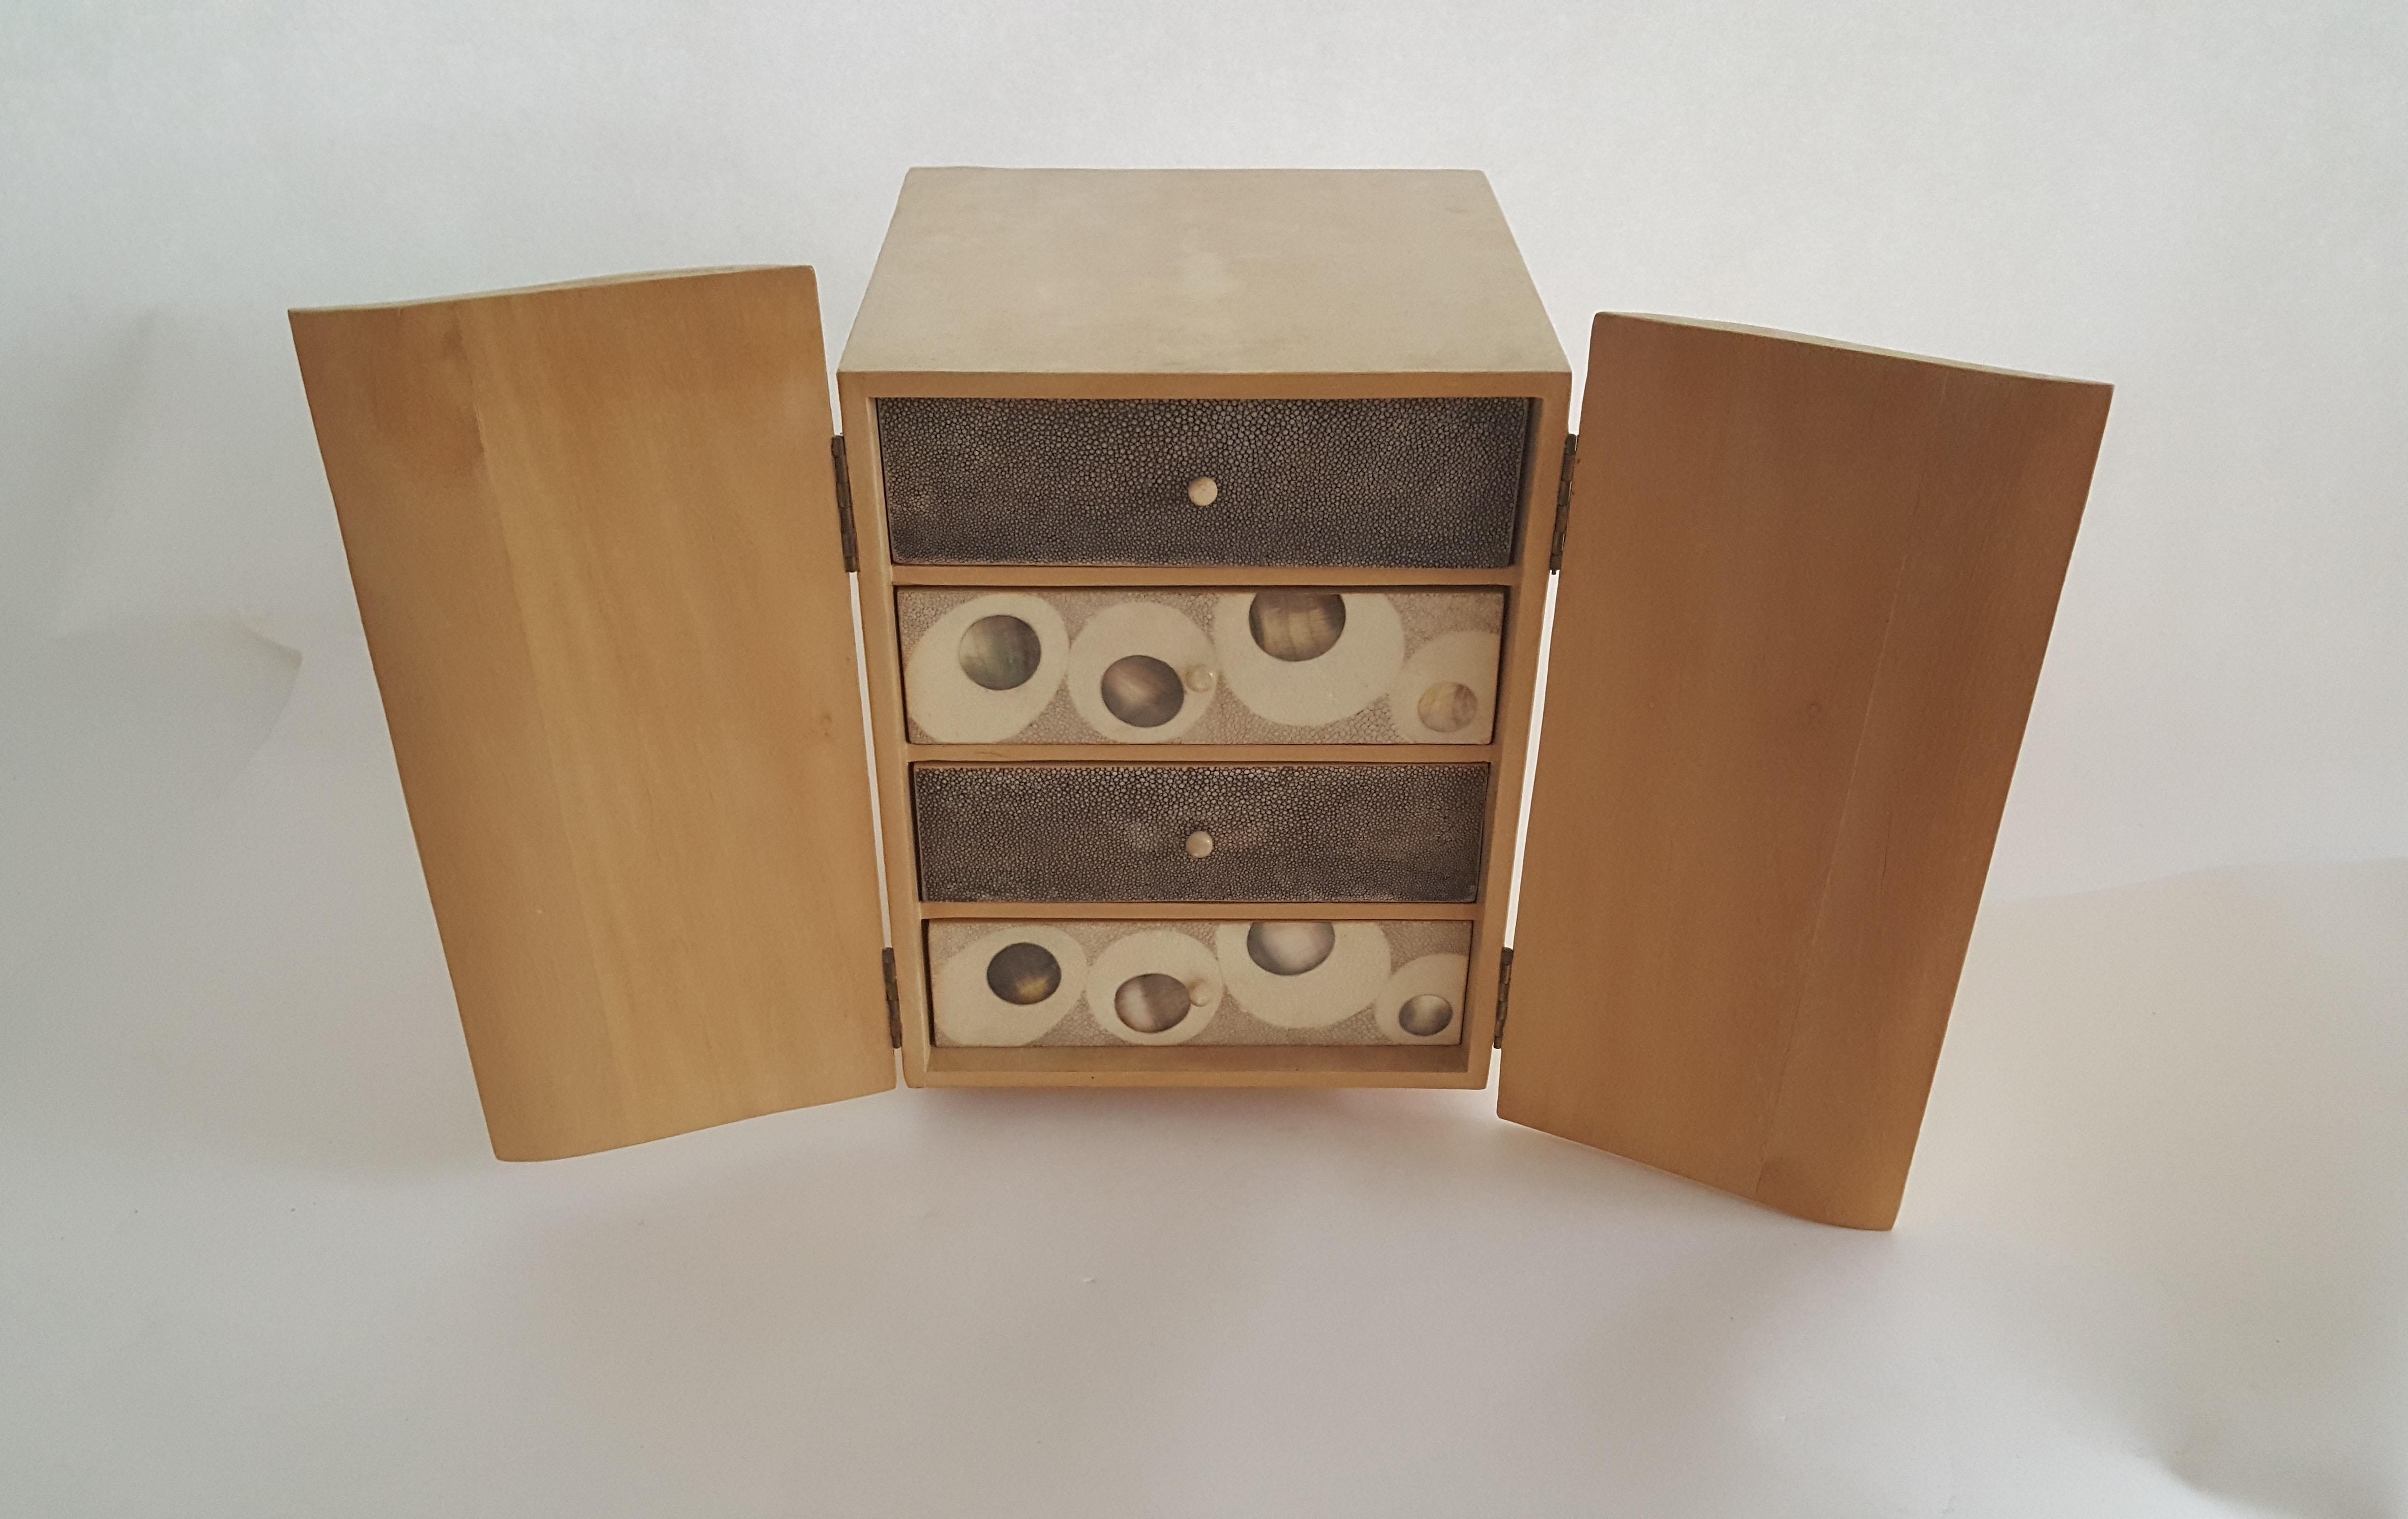 R Y Augousti Wood Shagreen Jewelry Box Chairish